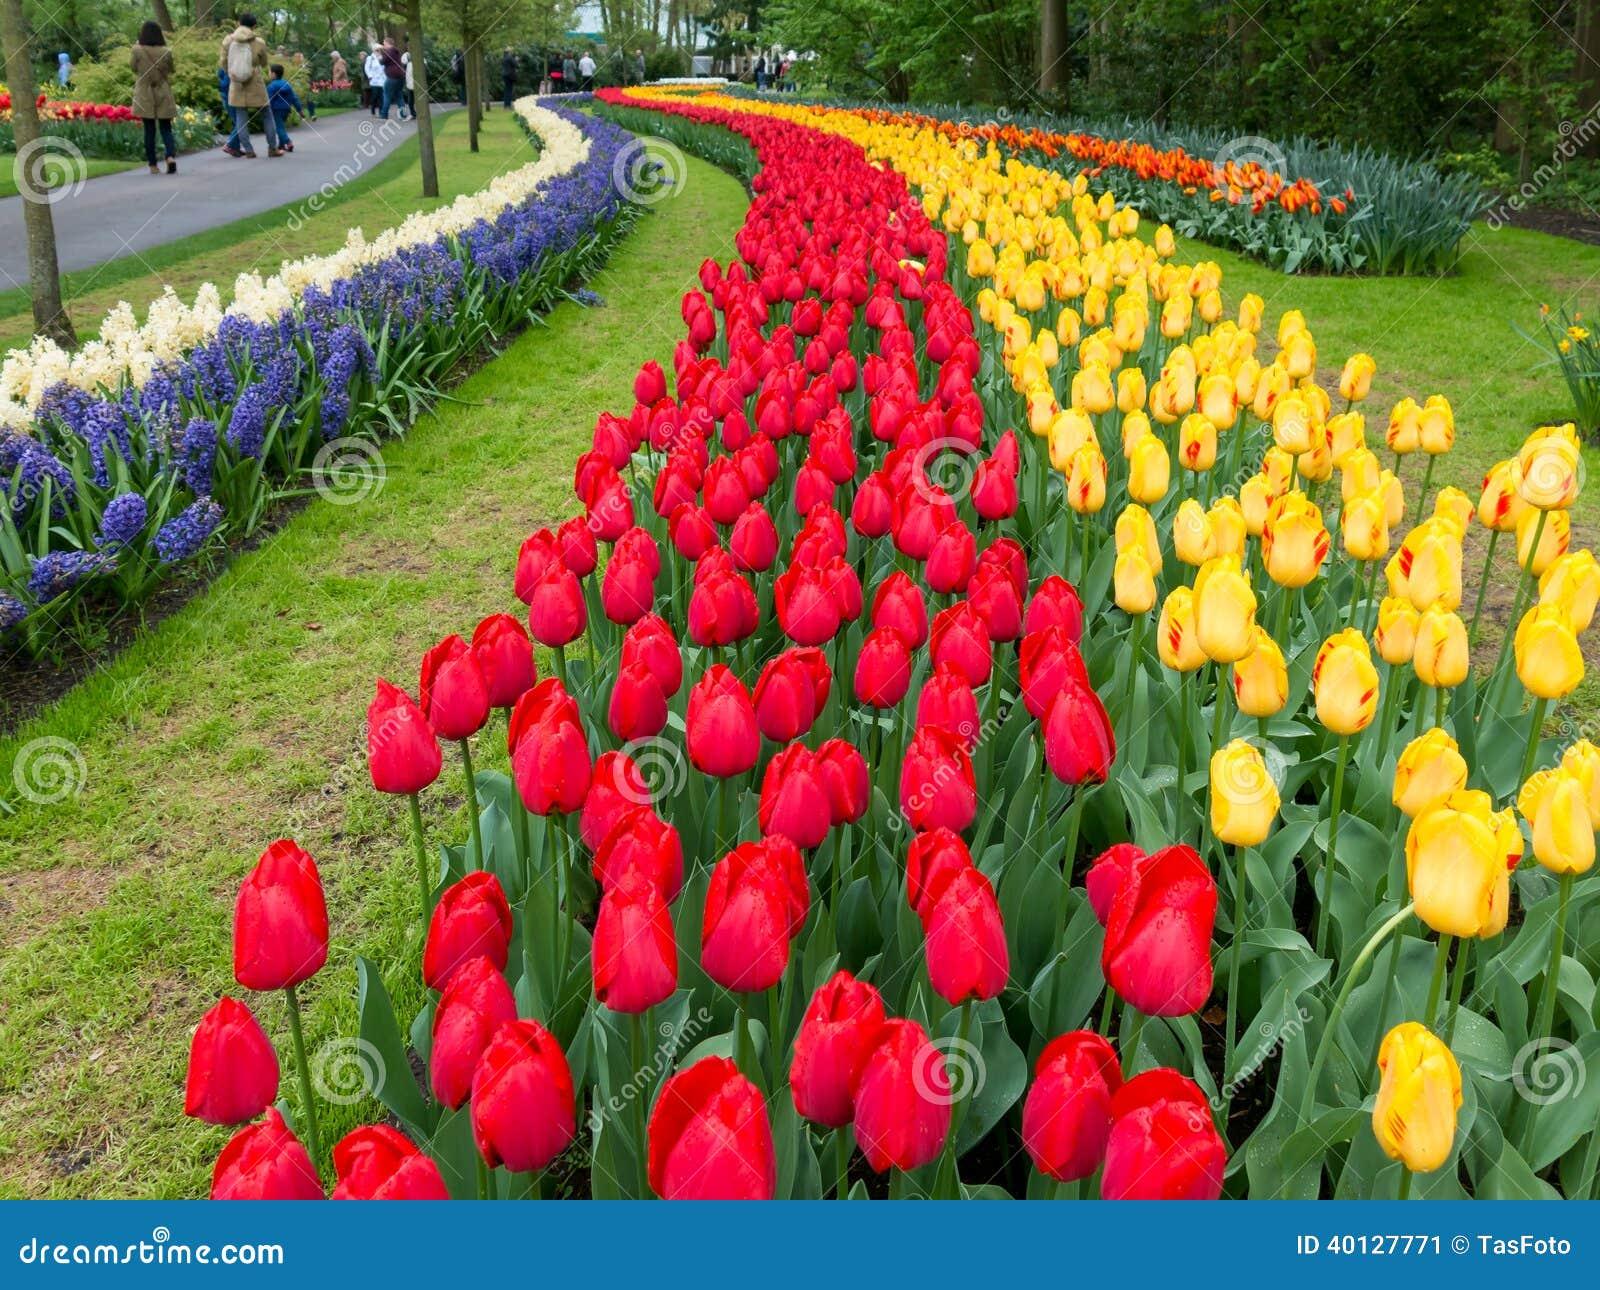 Tulipanes en los jardines de keukenhof en holanda foto - Jardines de holanda ...